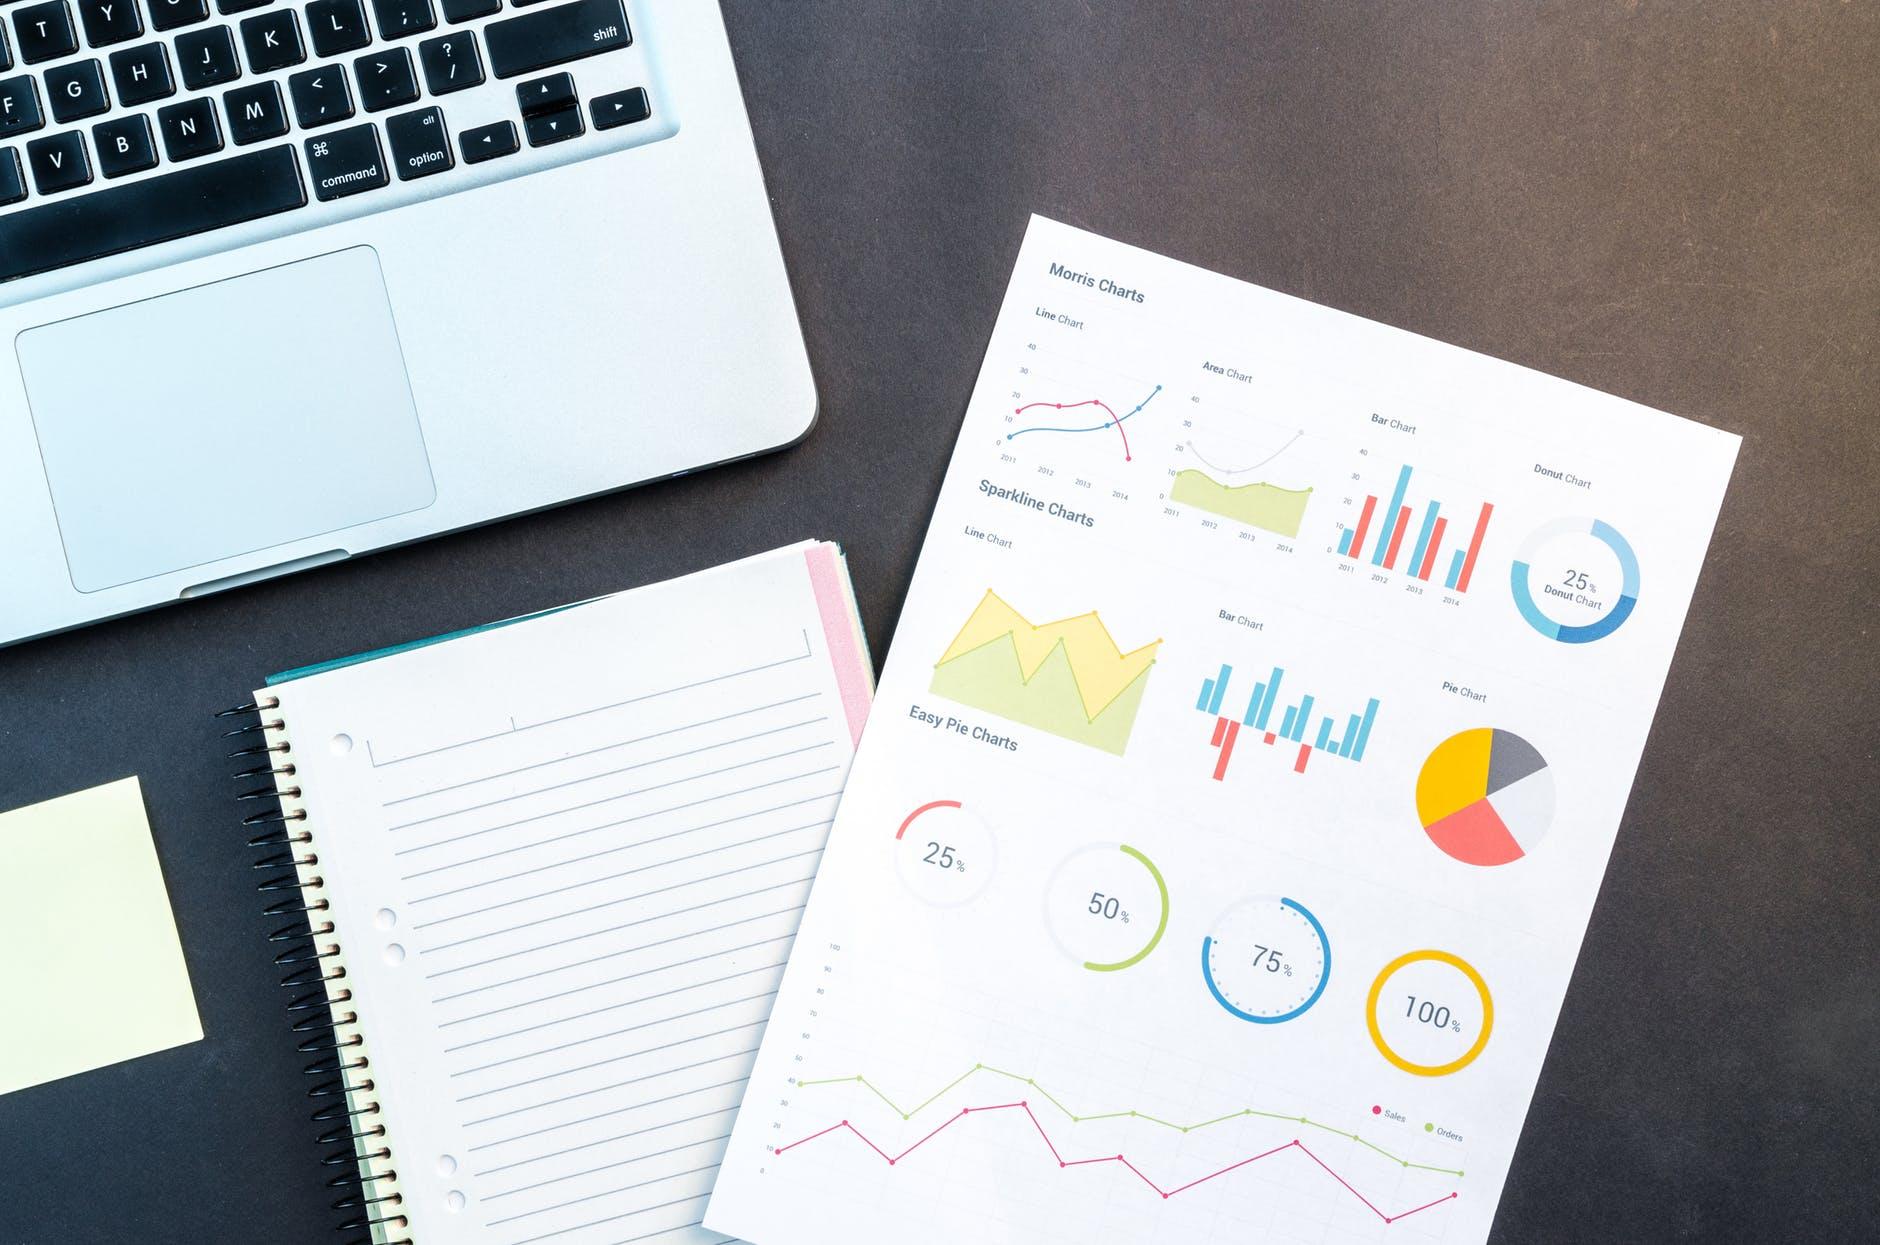 étude cles campagne drive to web efficace